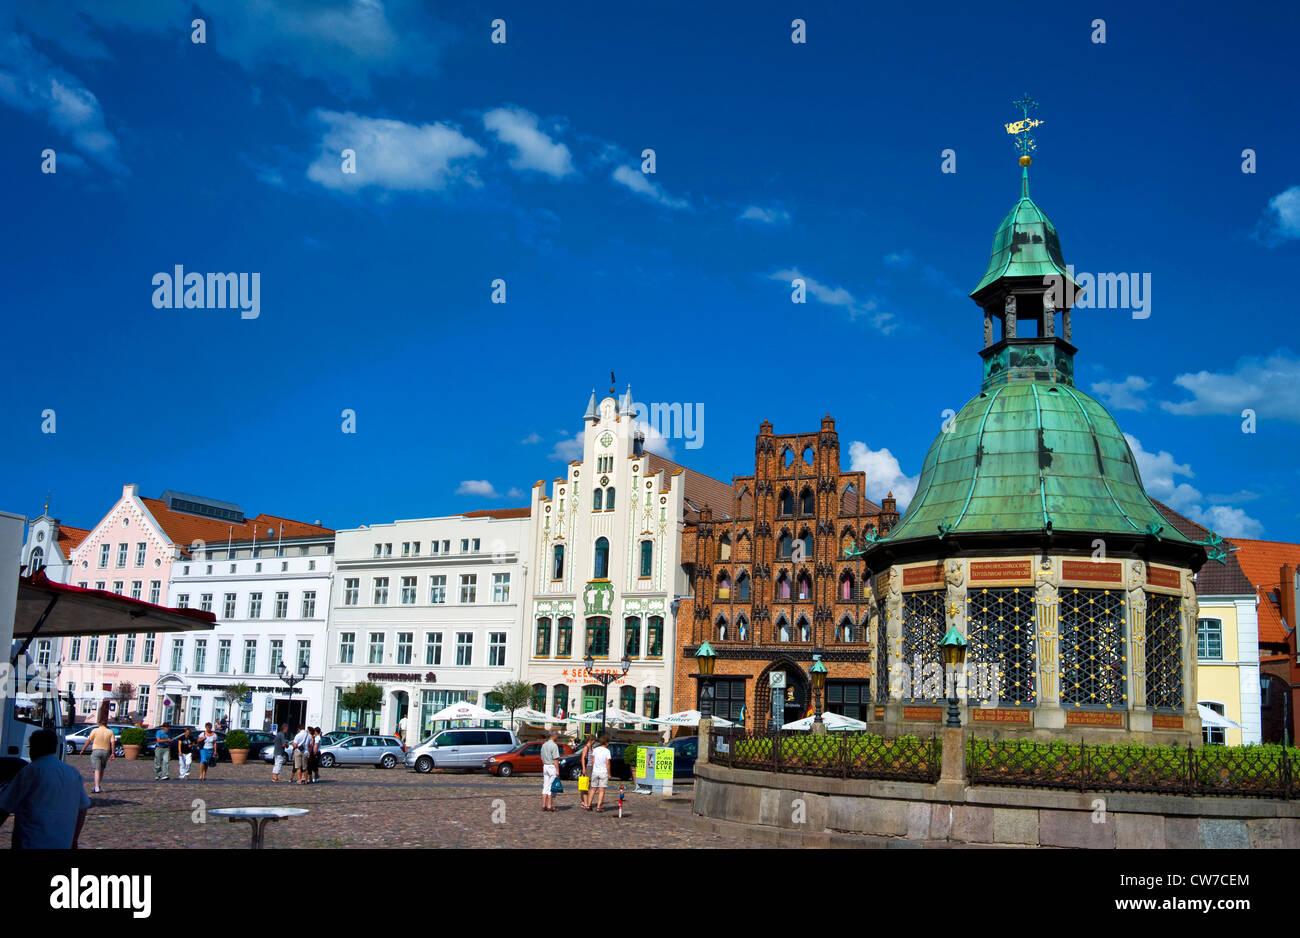 market place with Wismarer Wasserkunst, Germany, Mecklenburg-Western Pomerania, Wismar - Stock Image